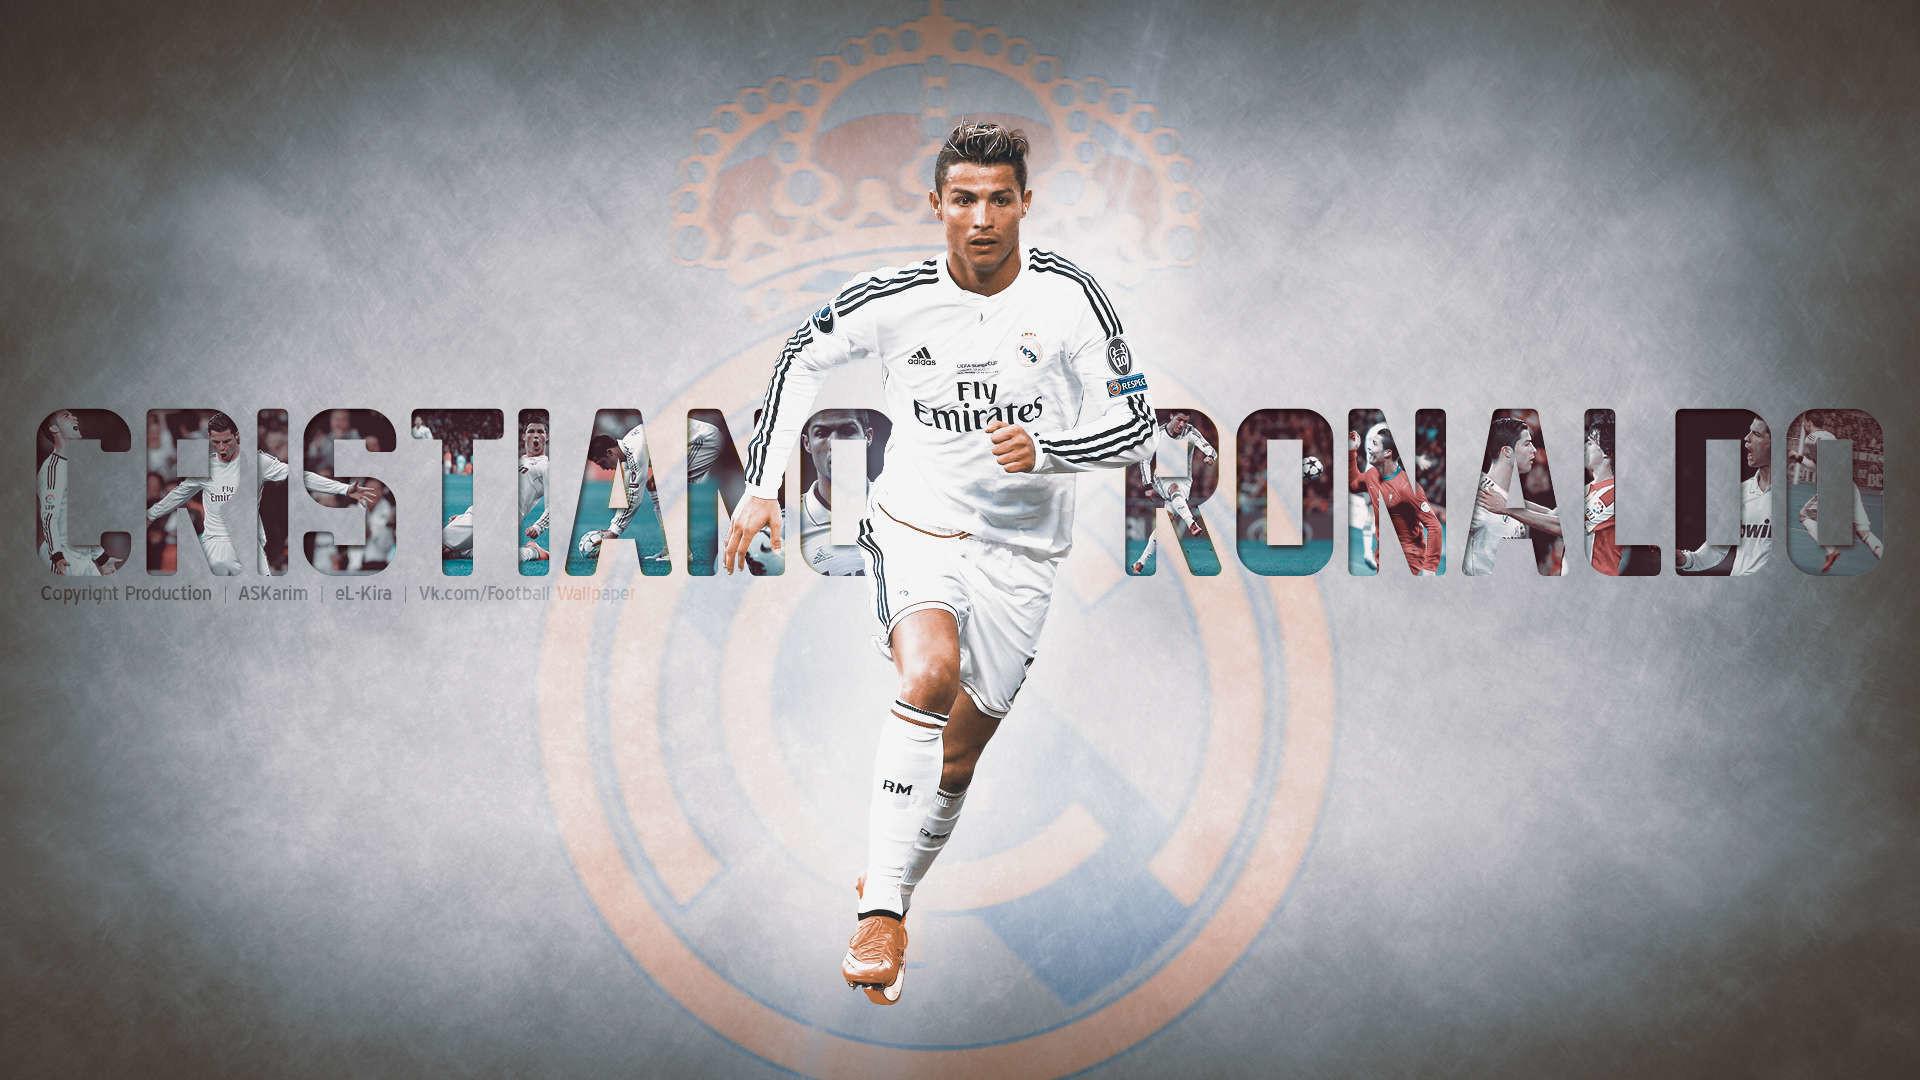 1920x1080 1920x1080 Cristiano Ronaldo Photos And Wallpapers 2018